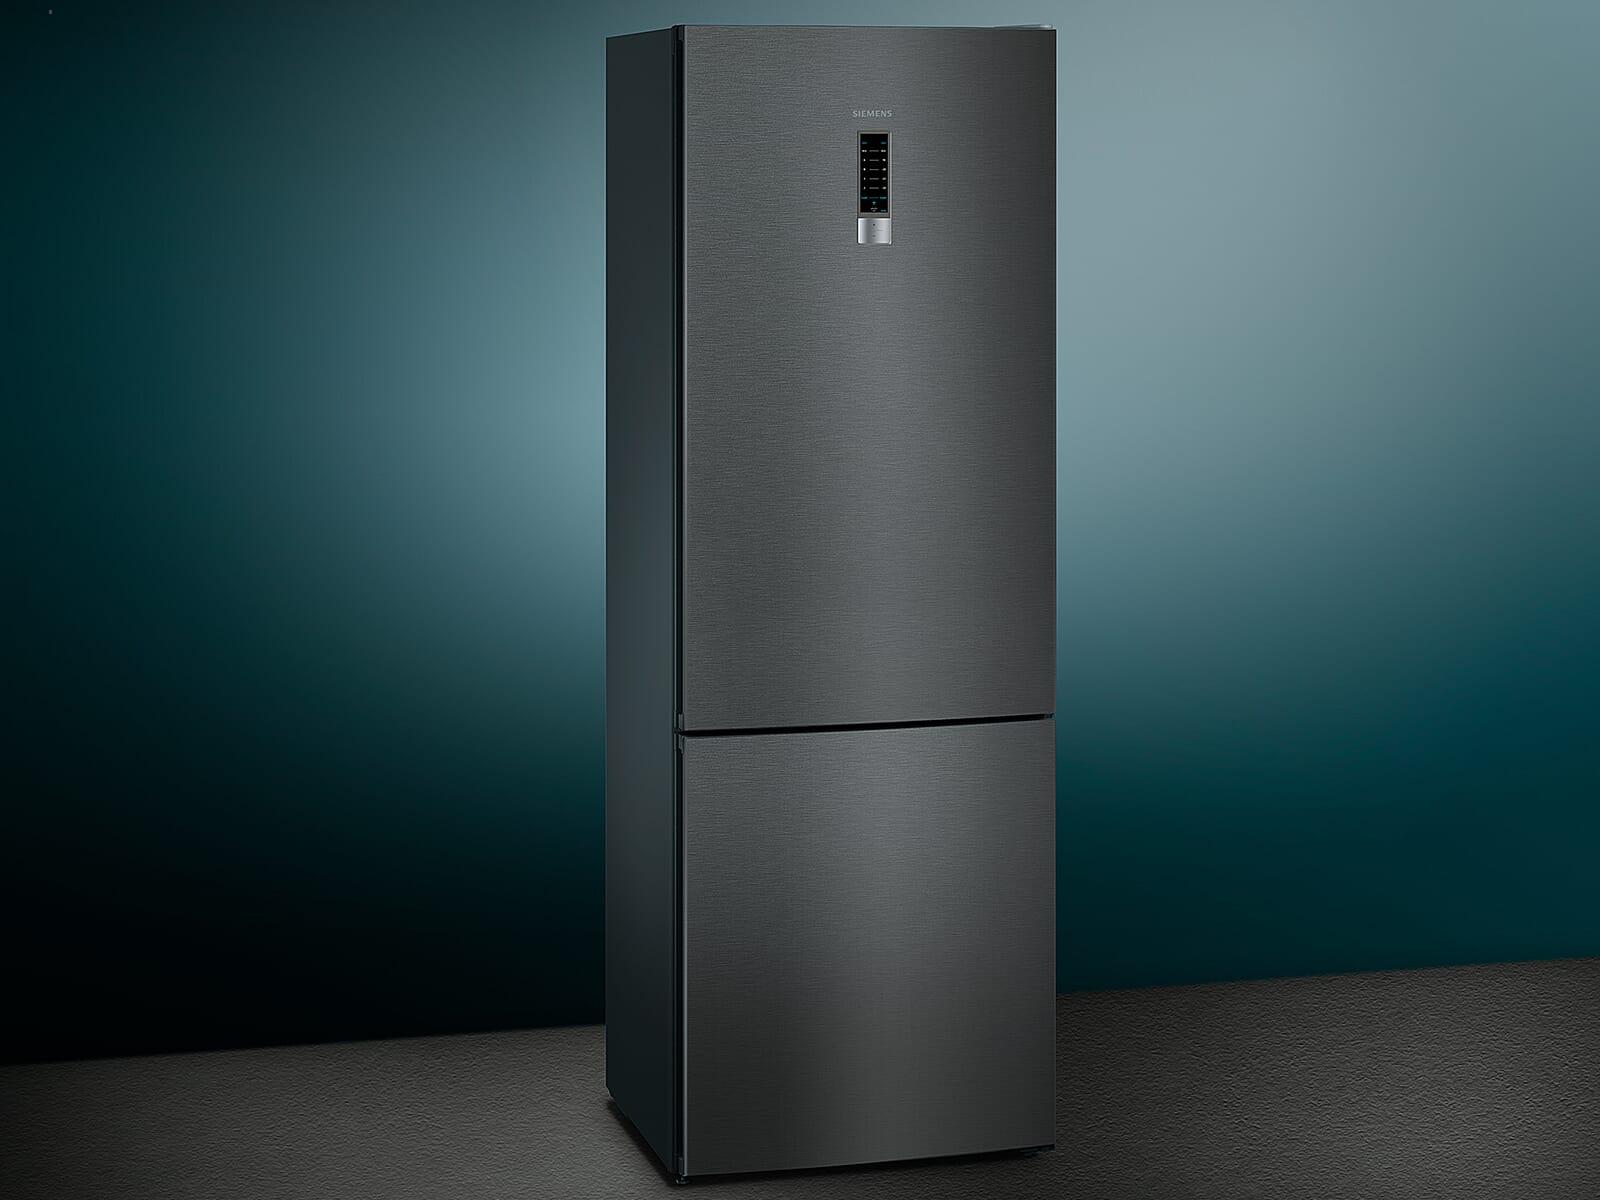 Retro Kühlschrank Karstadt : Kühl gefrierkombination schwarz kühl gefrierkombination test